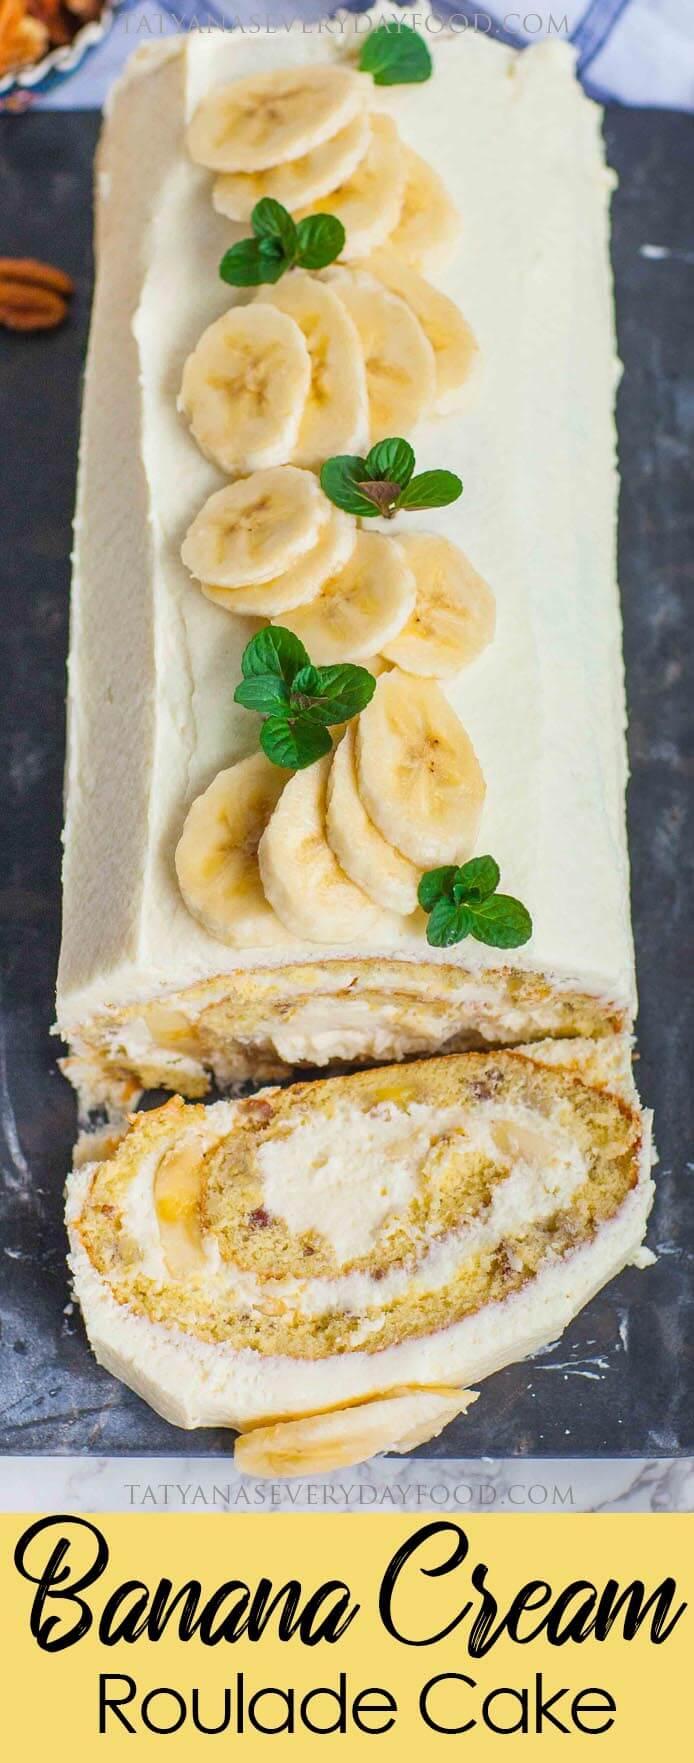 Amazing Banana Cream Cake Roll recipe with video